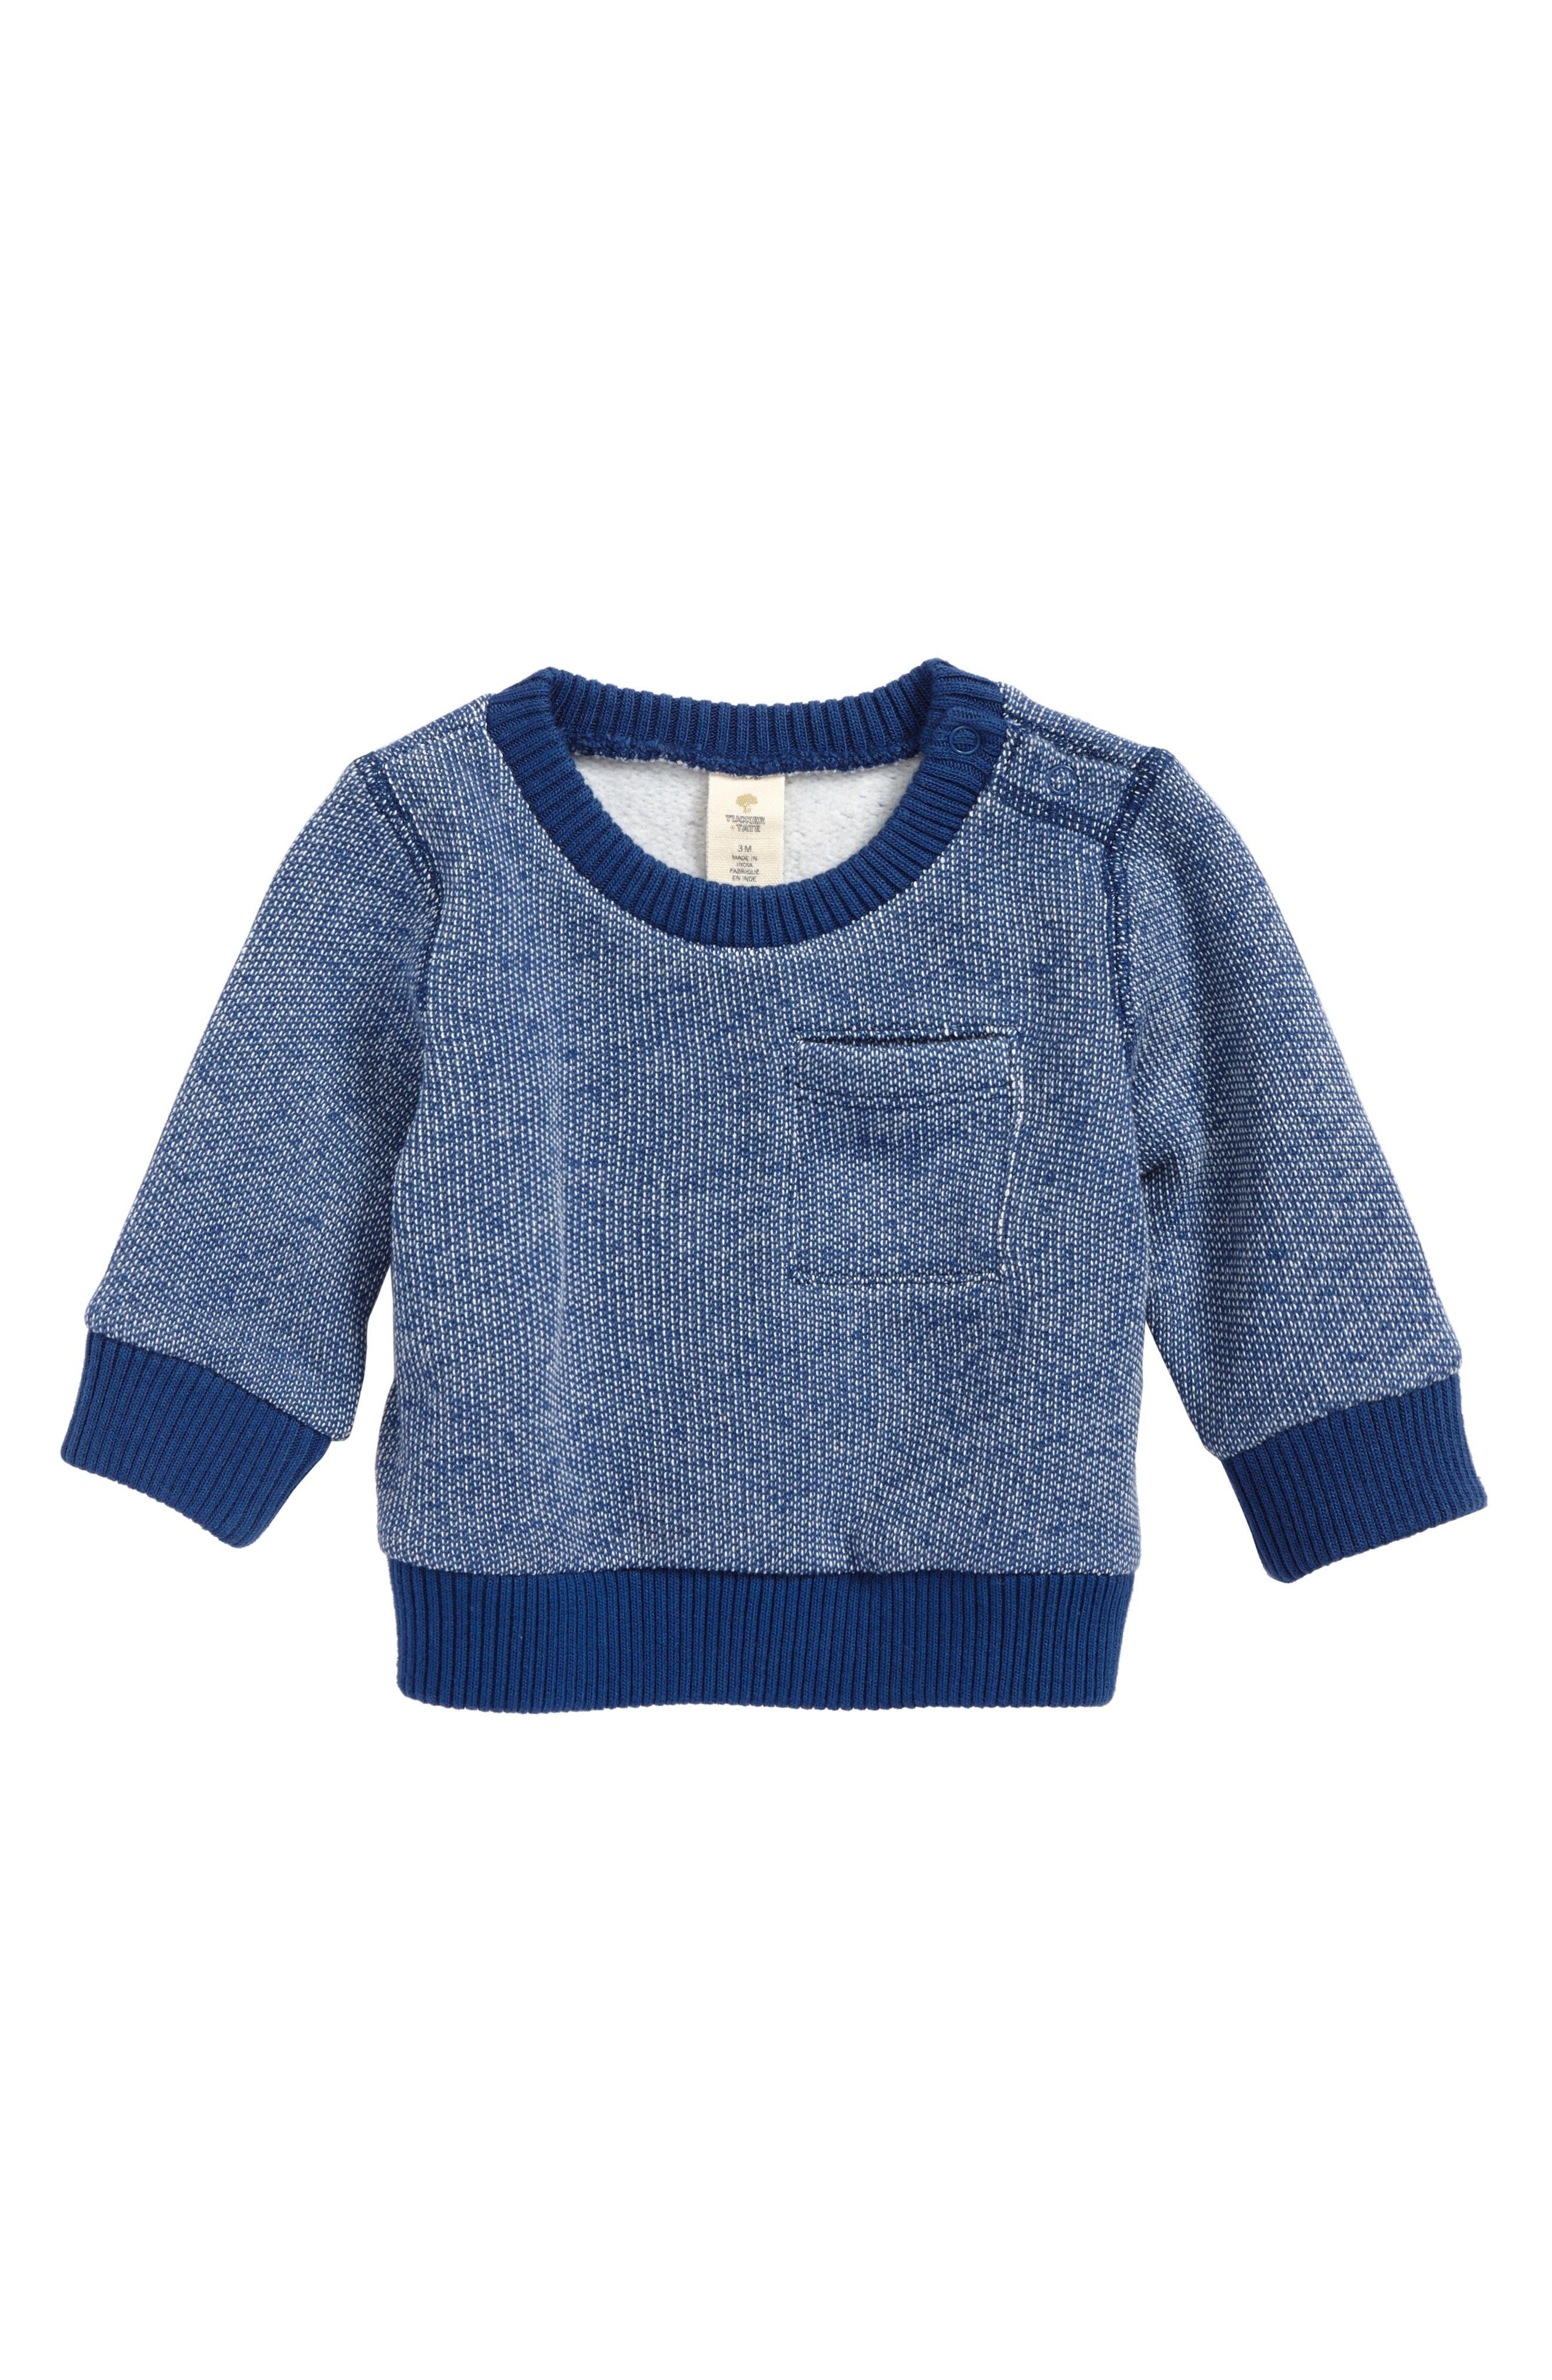 Brushed Fleece Sweatshirt,                             Main thumbnail 1, color,                             450